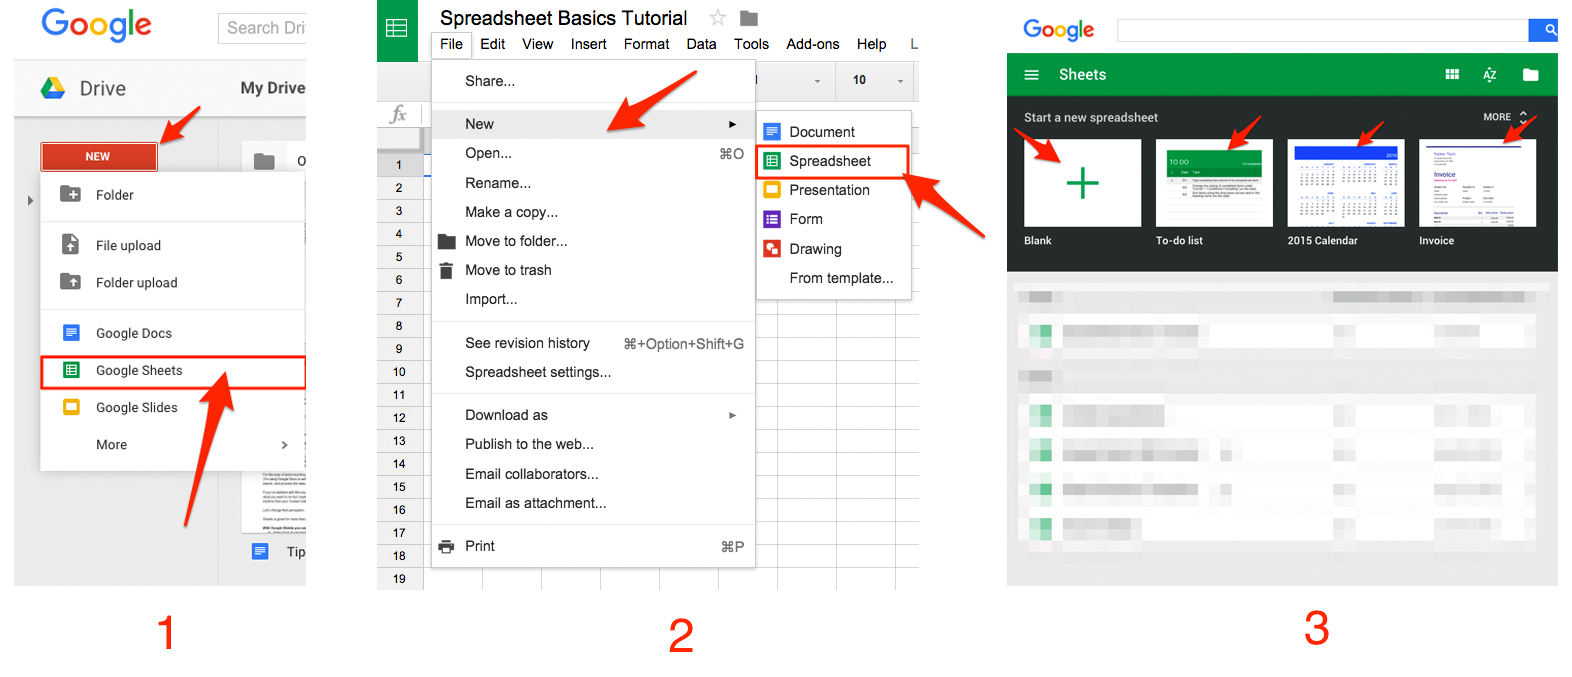 Online Spreadsheets Excel Inside Google Sheets 101: The Beginner's Guide To Online Spreadsheets  The